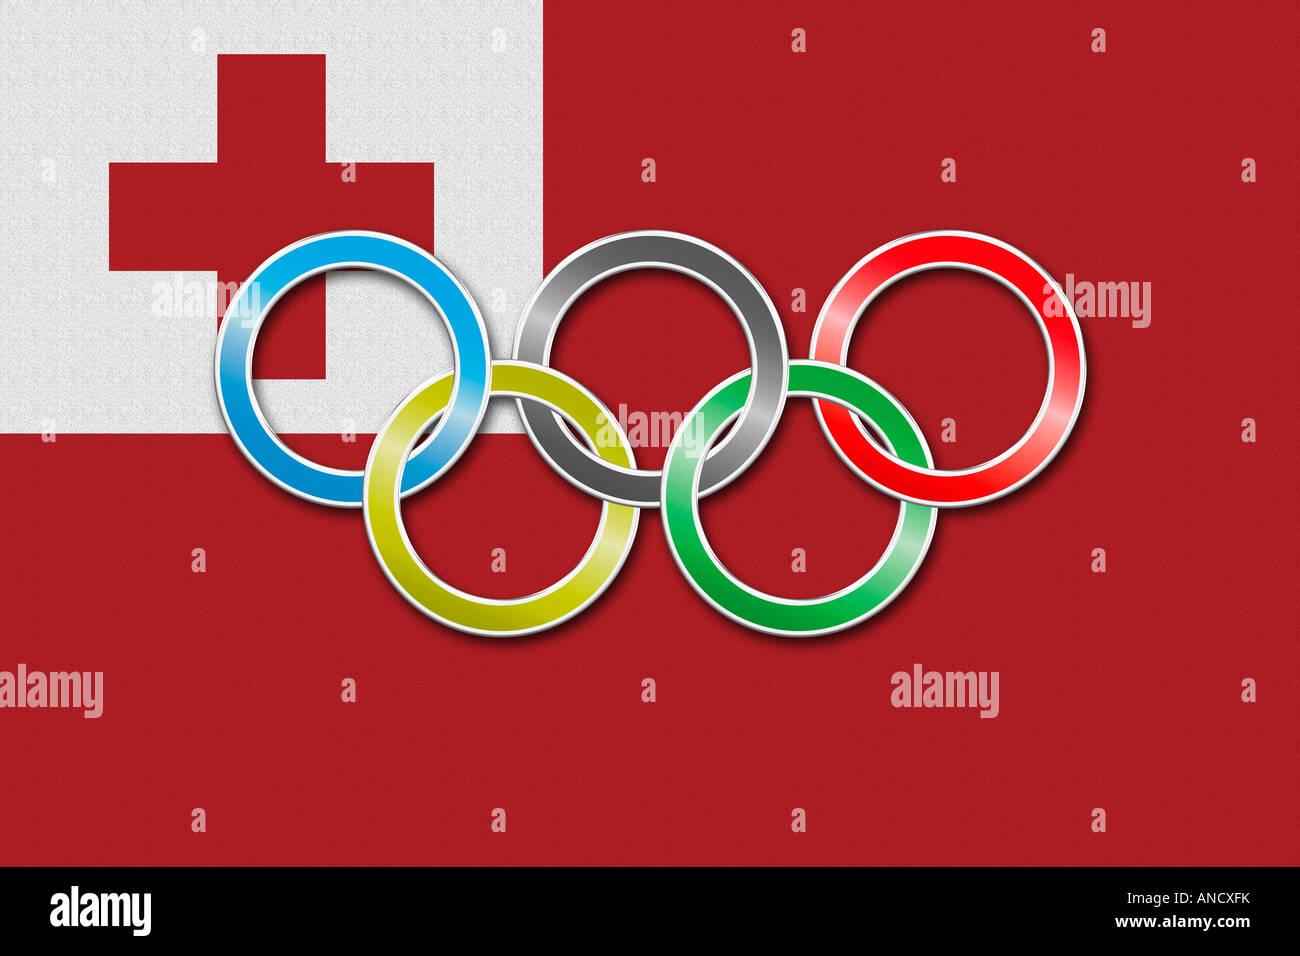 Flag of Tonga with olympic symbol - Stock Image